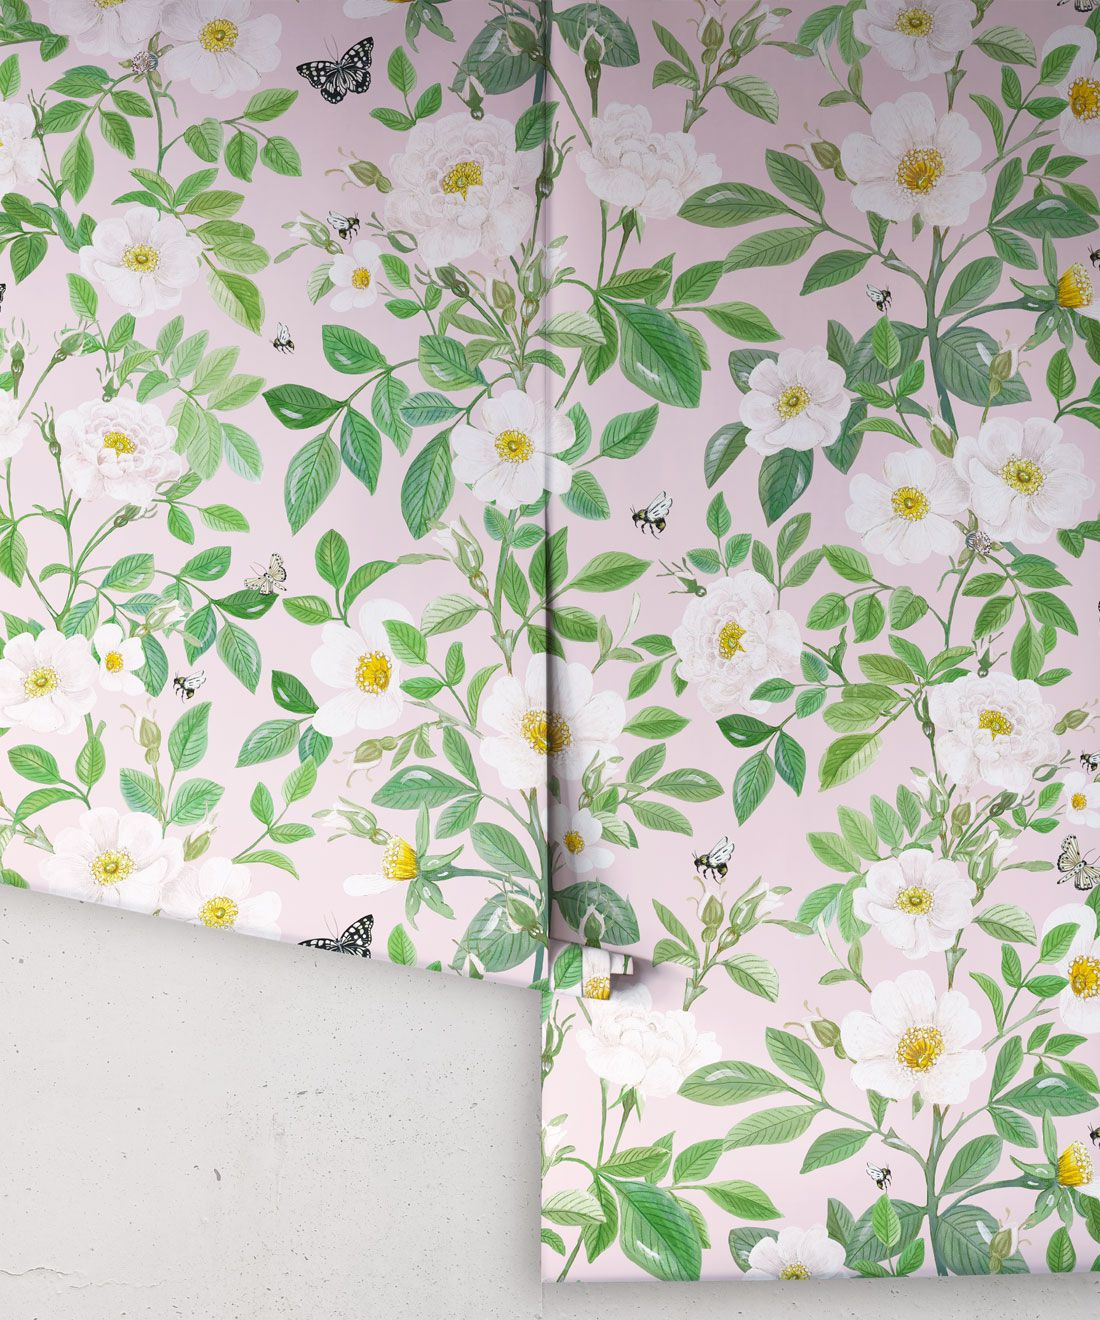 Rosa Wallpaper • Floral Wallpaper • Blush • Rolls